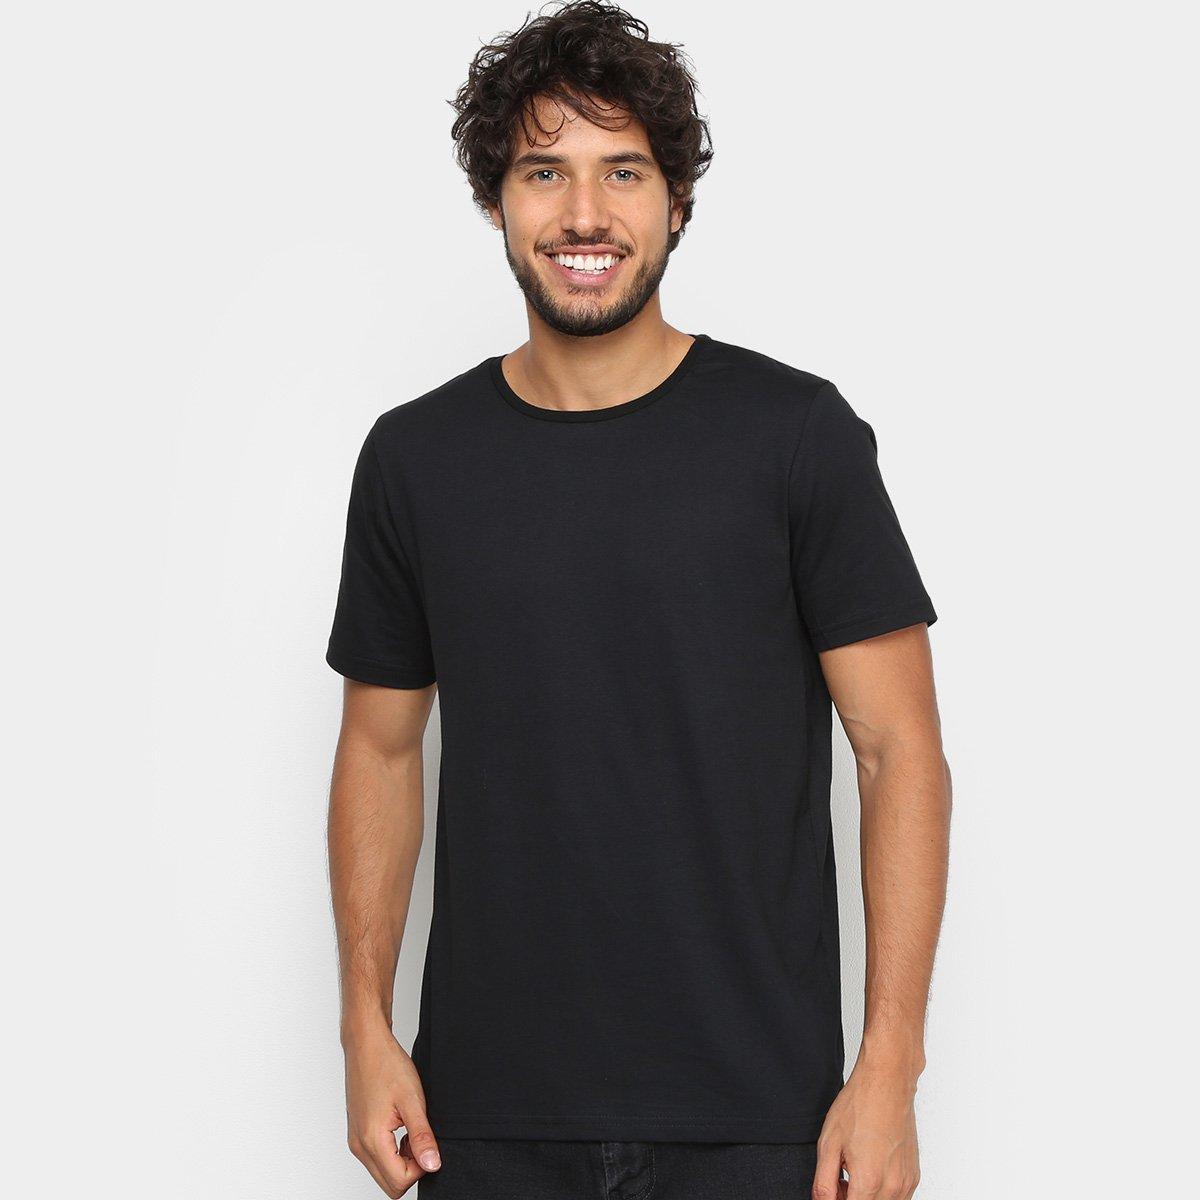 Kit Camiseta Básica c/ 5 Peças Masculinas - Tam: G - 1